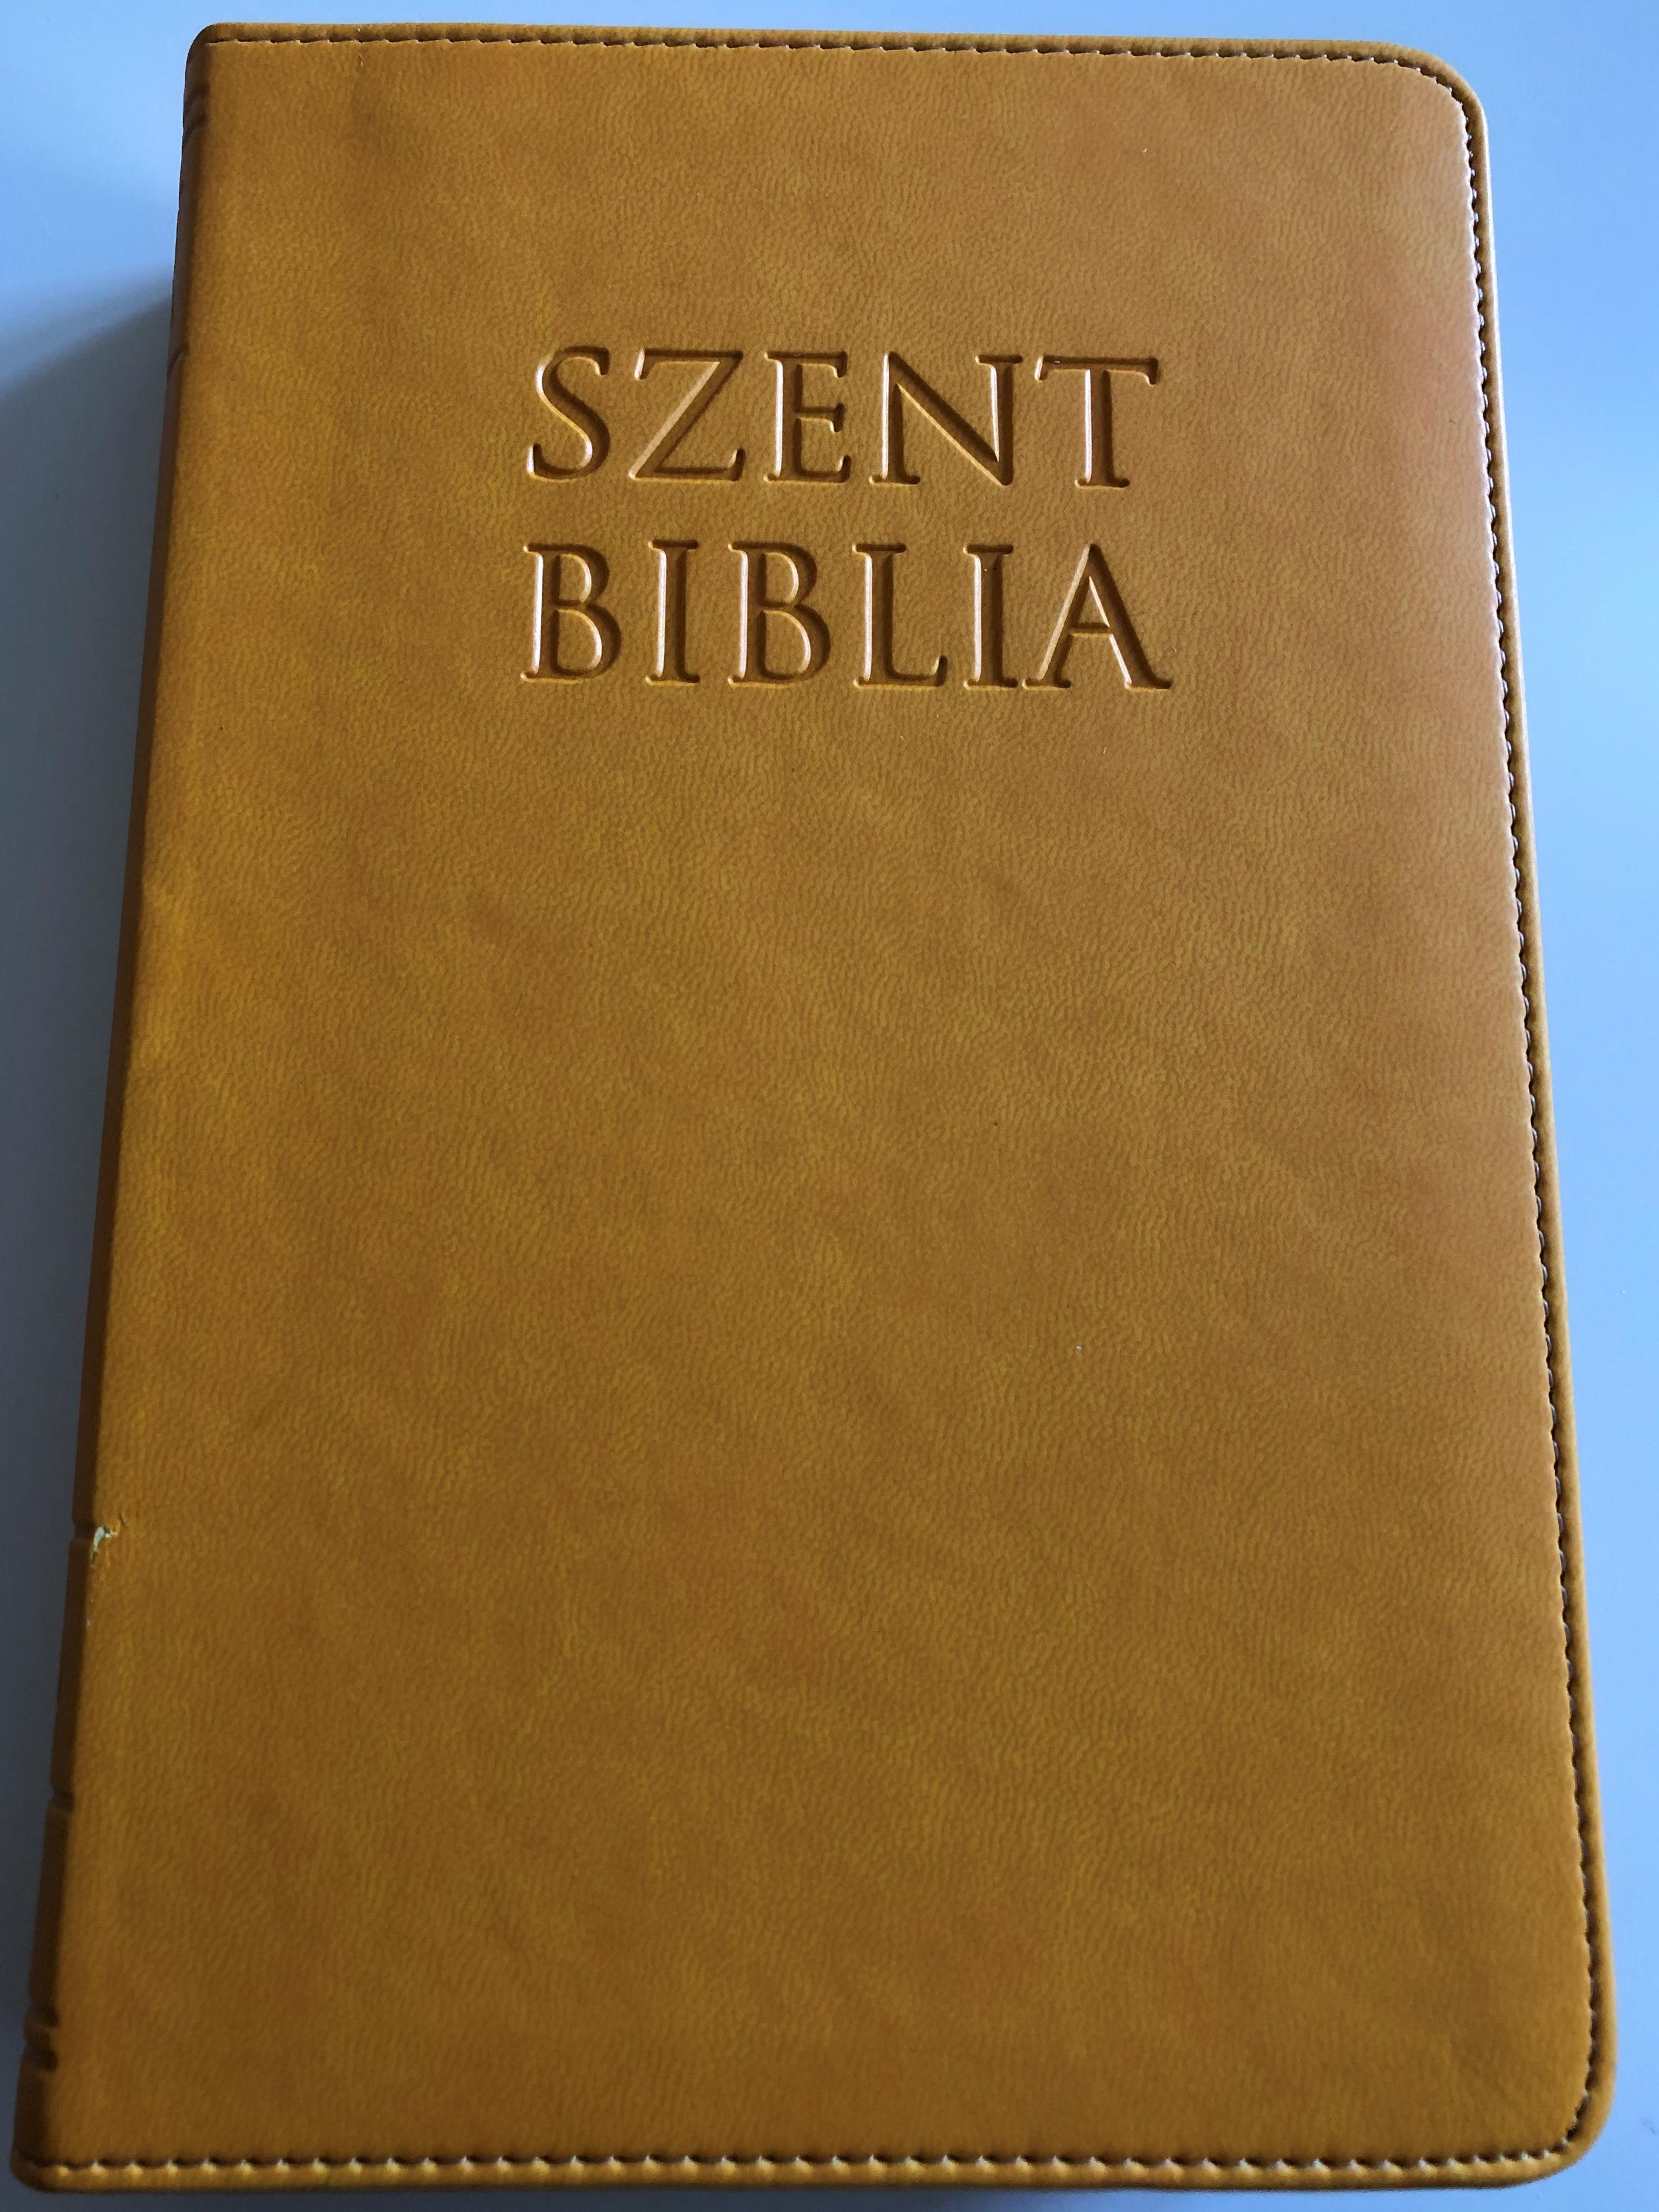 holy-bible-szent-biblia-k-roli-g-sp-r-sun-yellow-leather-bound-naps-rga-b-rk-t-s-golden-edges-words-of-christ-in-red-maps-timeline-j-zus-szavai-piros-kiemel-ssel-t-rk-pek-s-id-vonal-1-.jpg